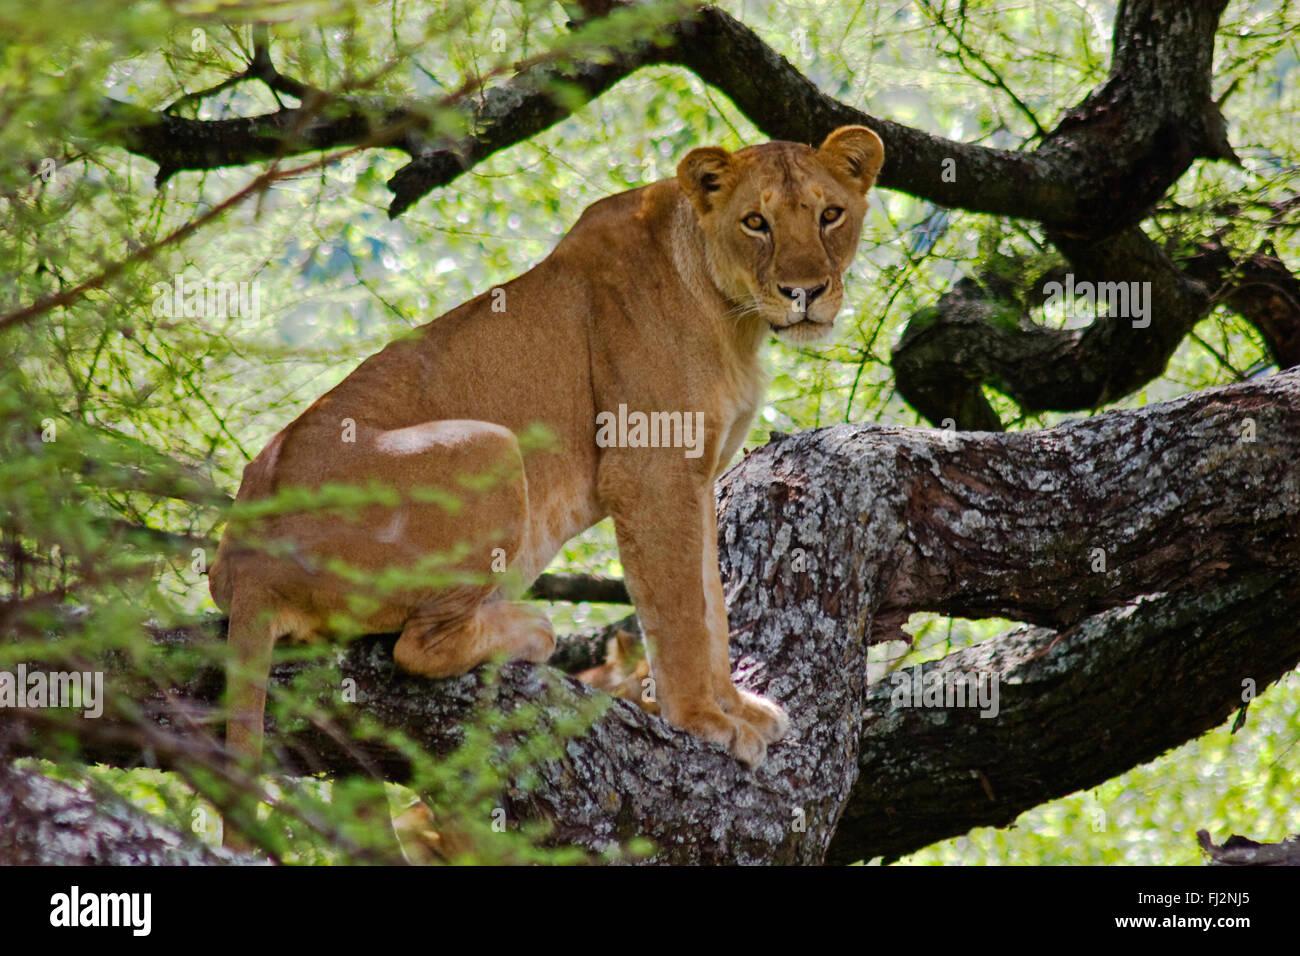 A female LION (Panthera leo) in a tree - LAKE MANYARA NATIONAL PARK, TANZANIA - Stock Image